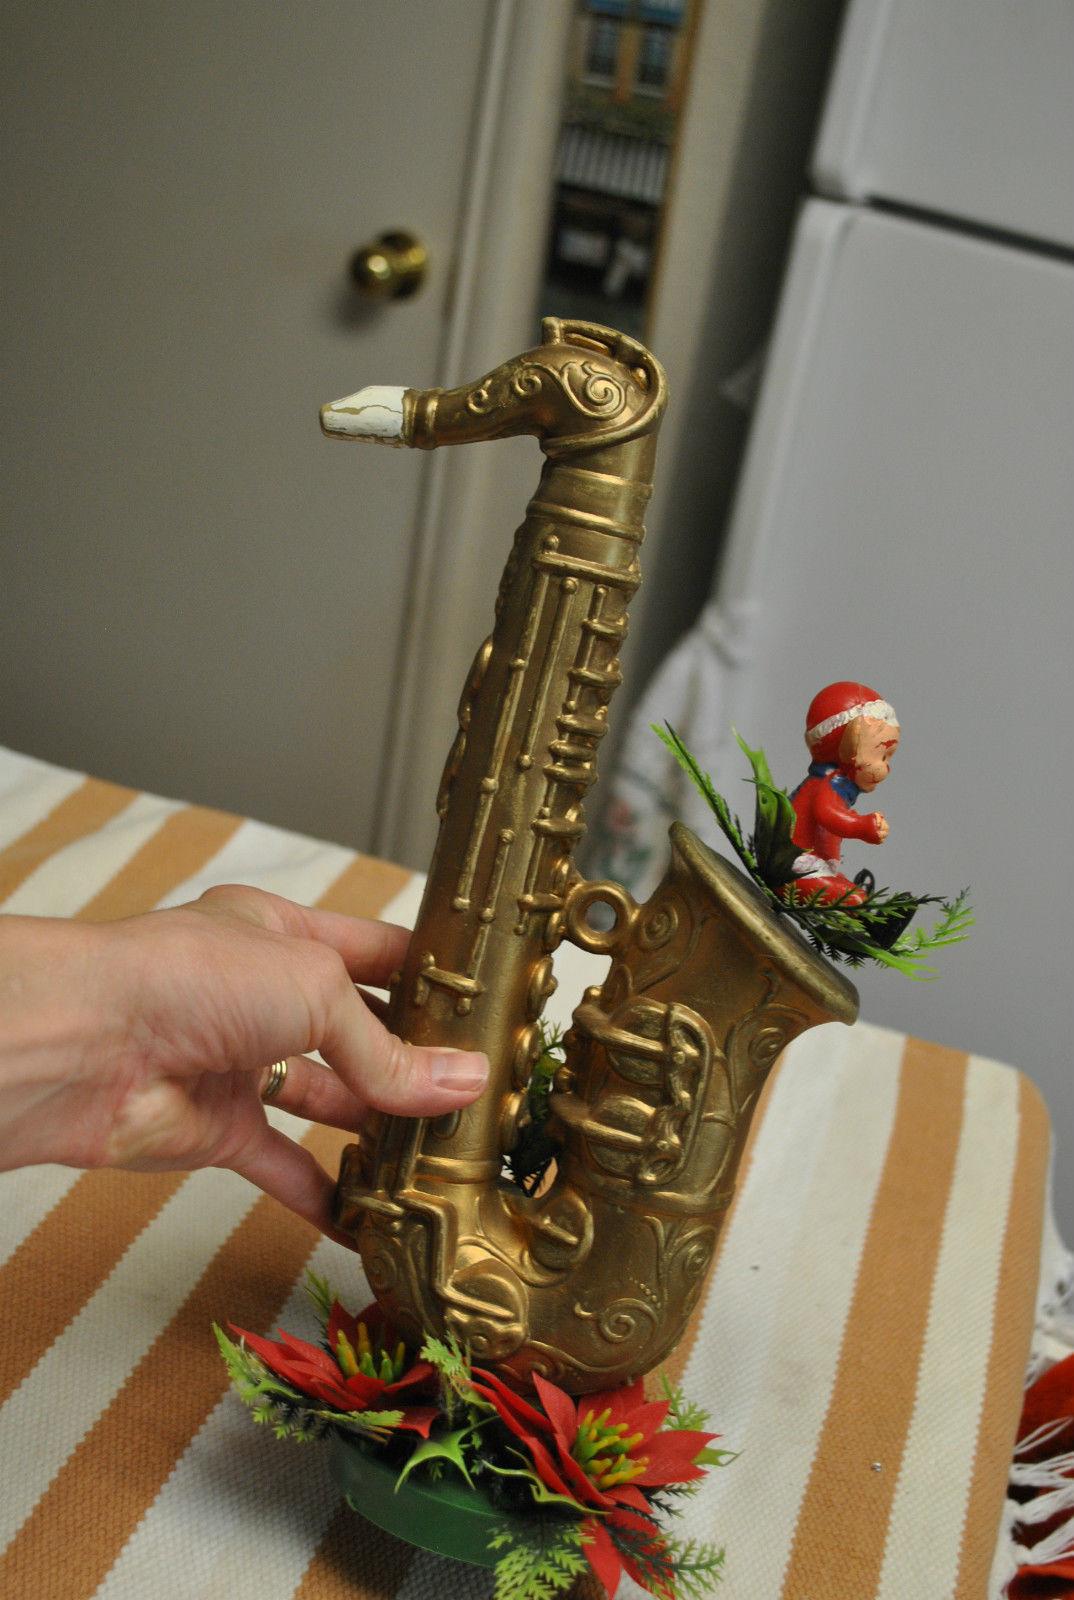 plastic holiday decoration, saxophone Christmas decoration, mid-century Christmas decor, saxy Christmas kitsch